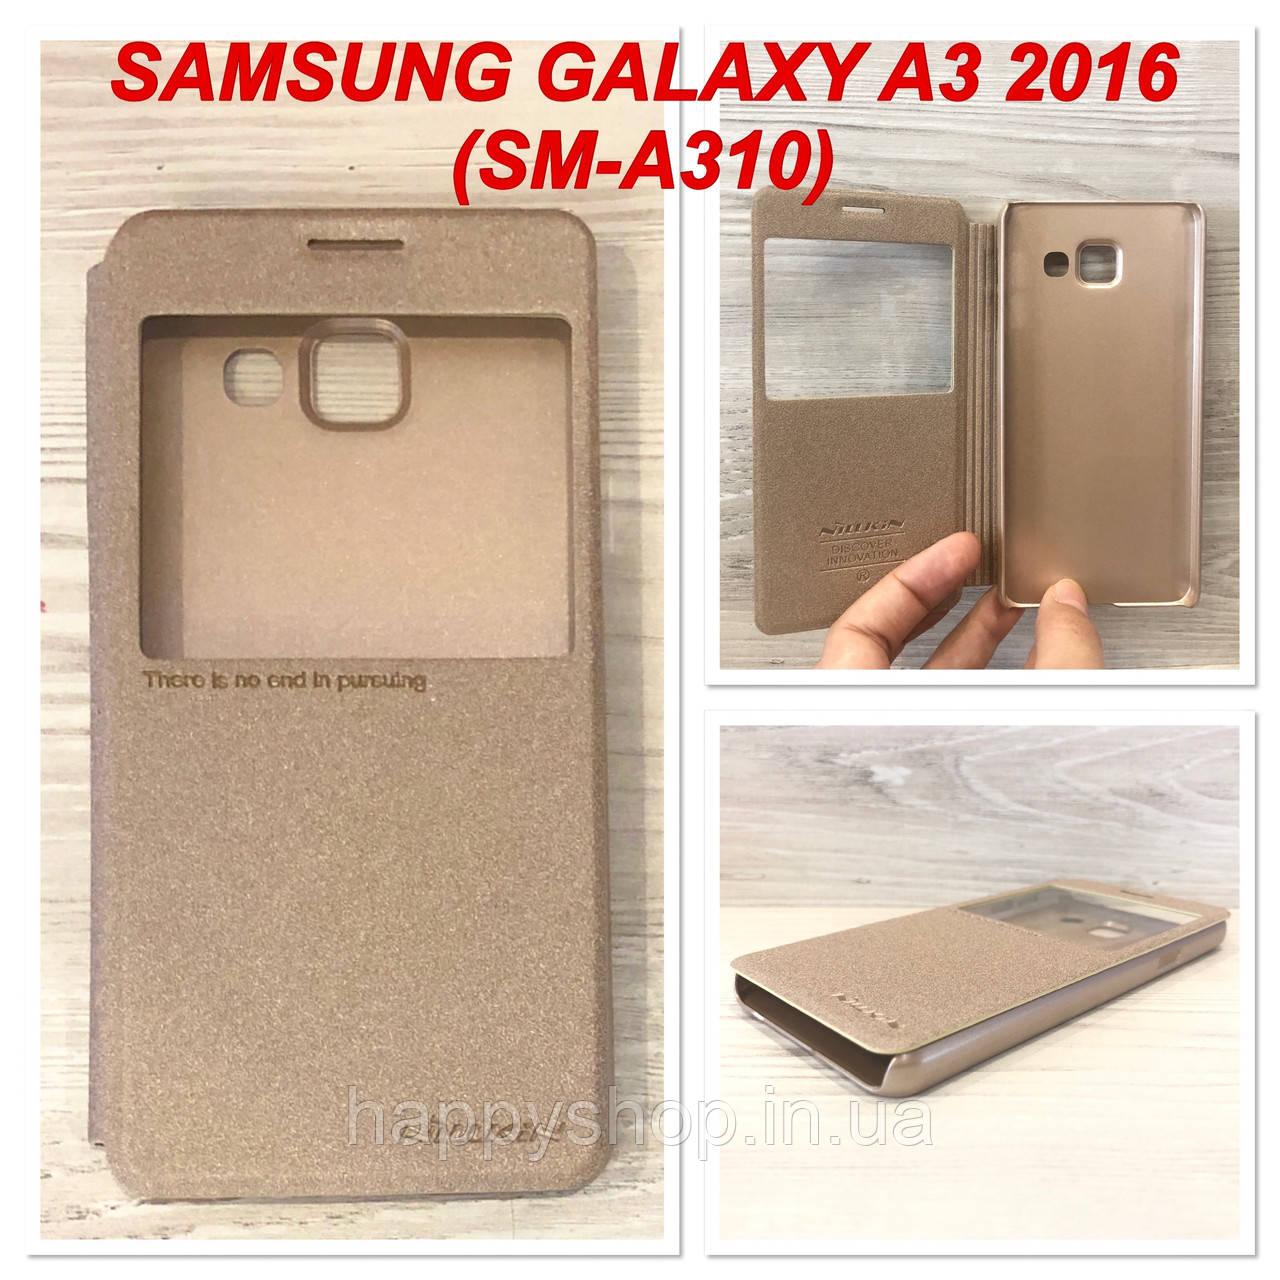 Чехол-книжка с окошком Nillkin для Samsung Galaxy A3 2016 (SM-A310) Золотой